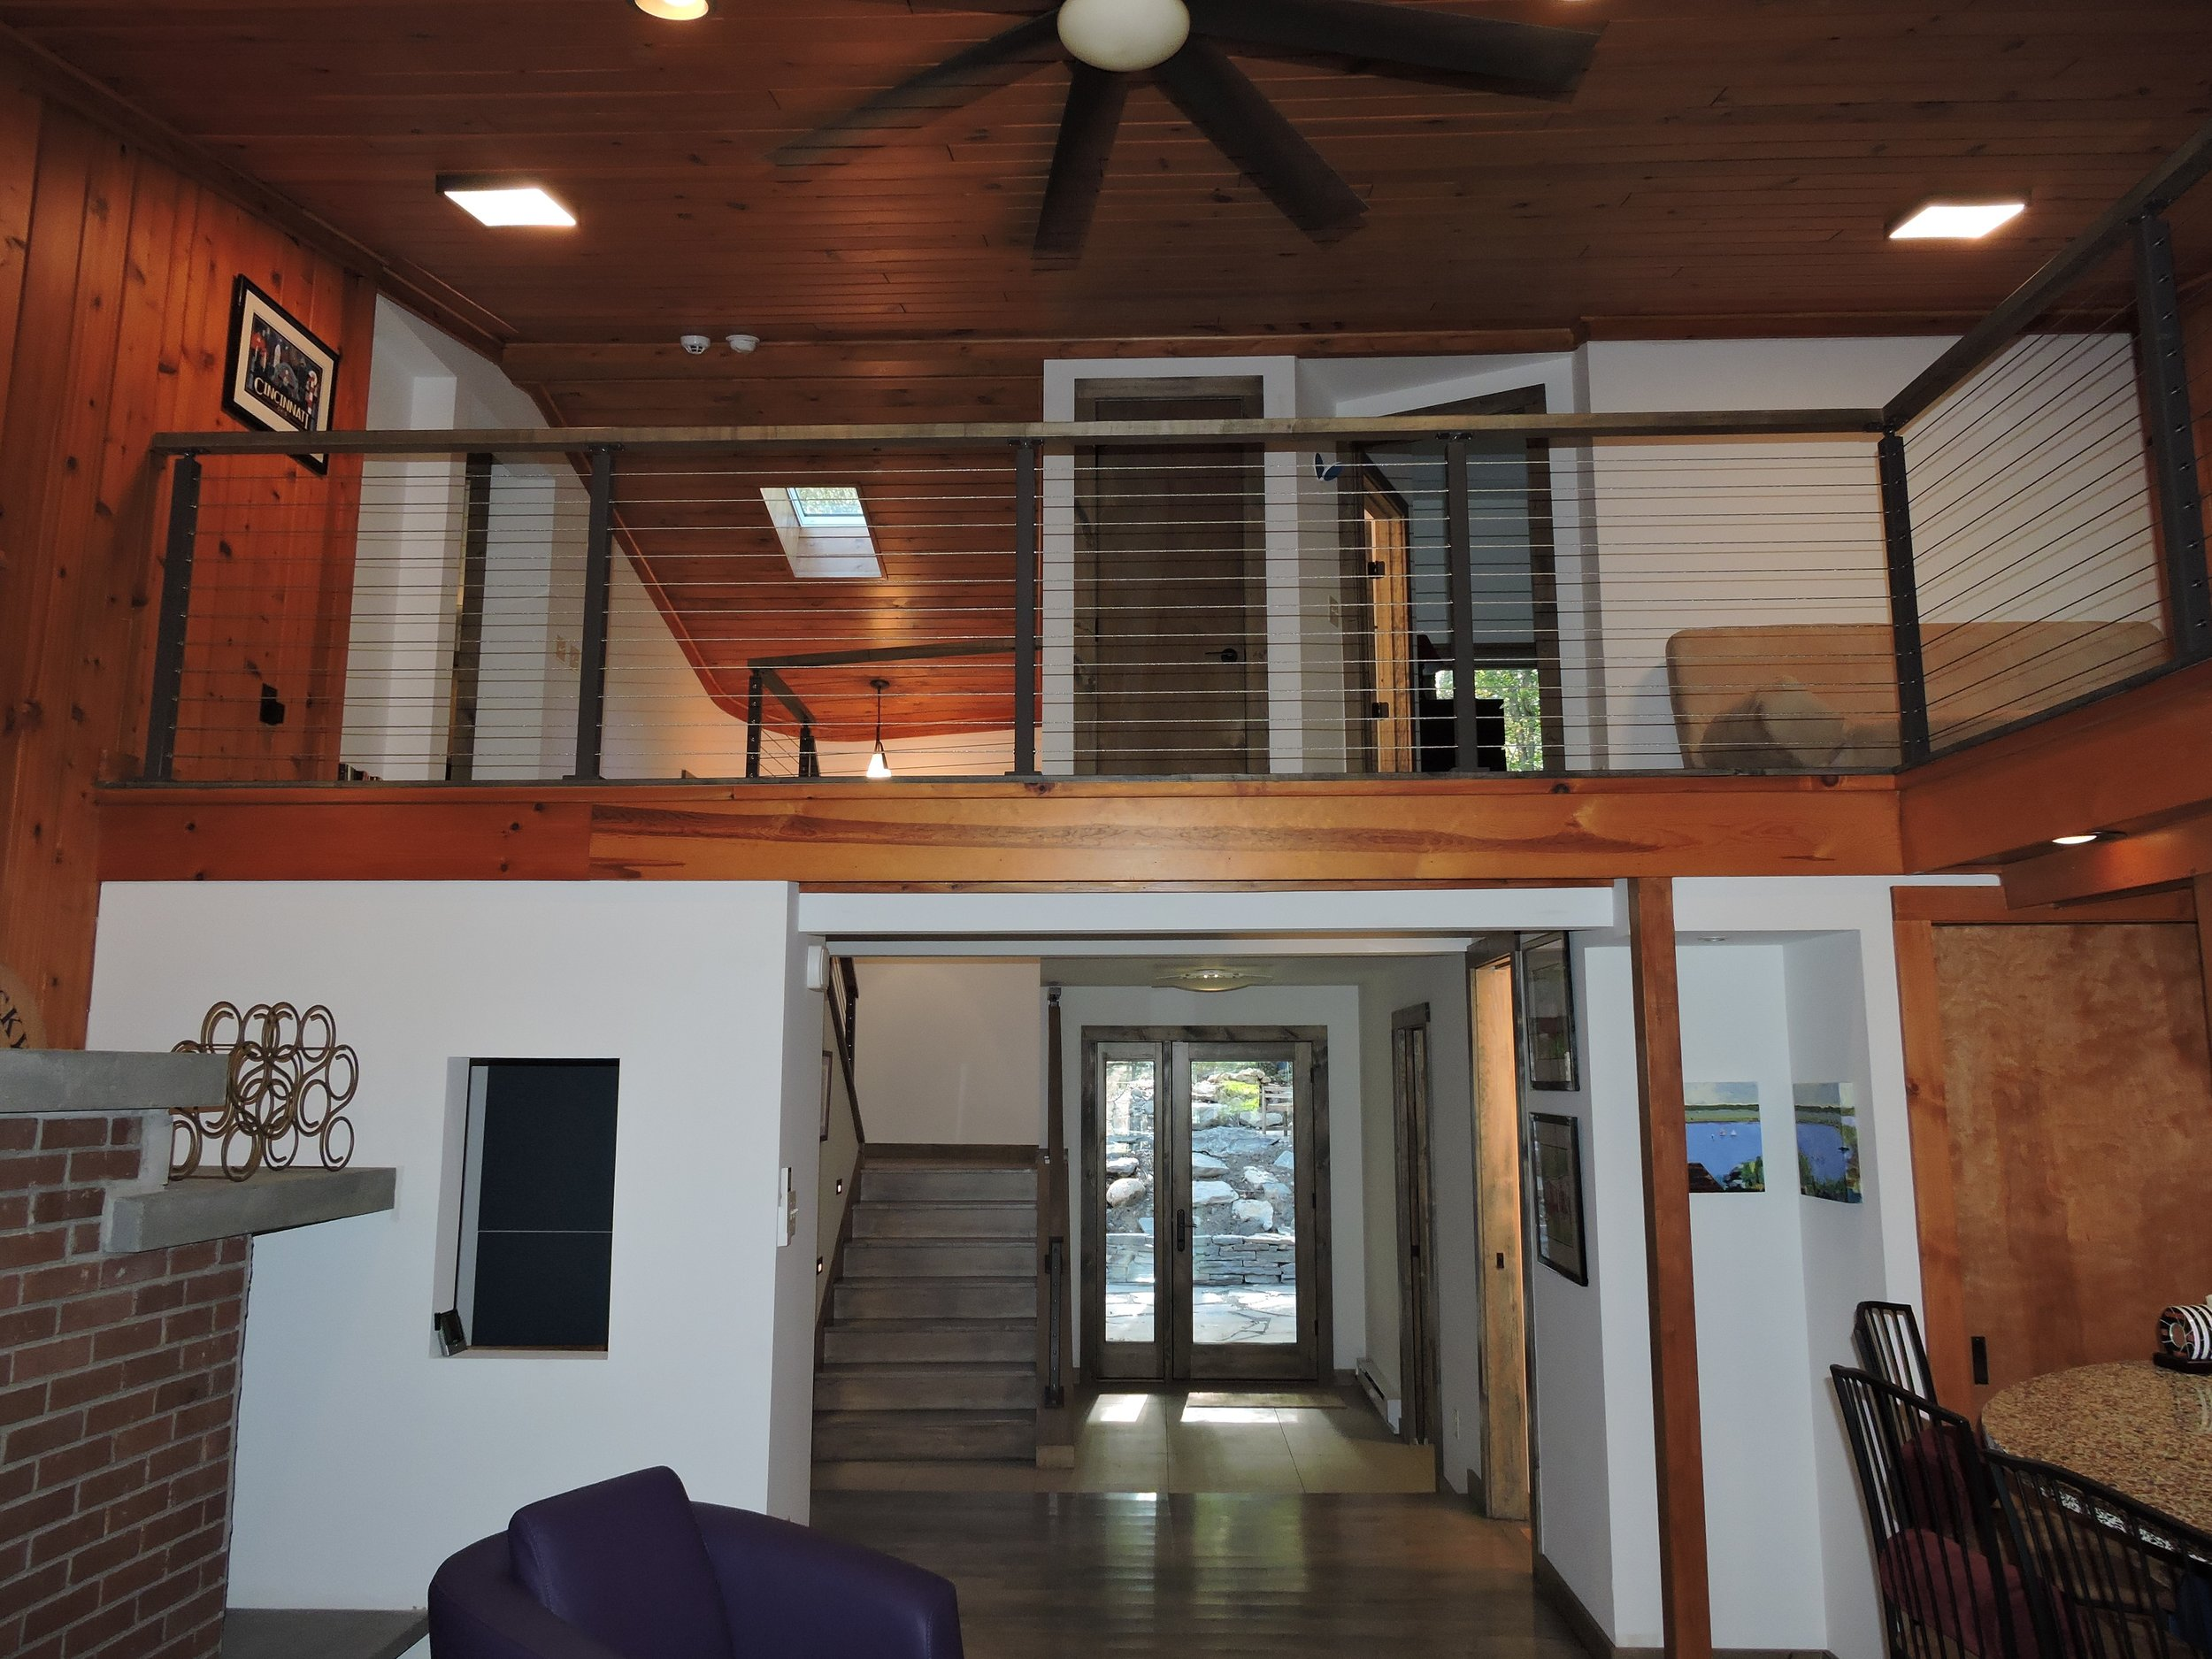 Nordstrom interior 2 levels.jpg